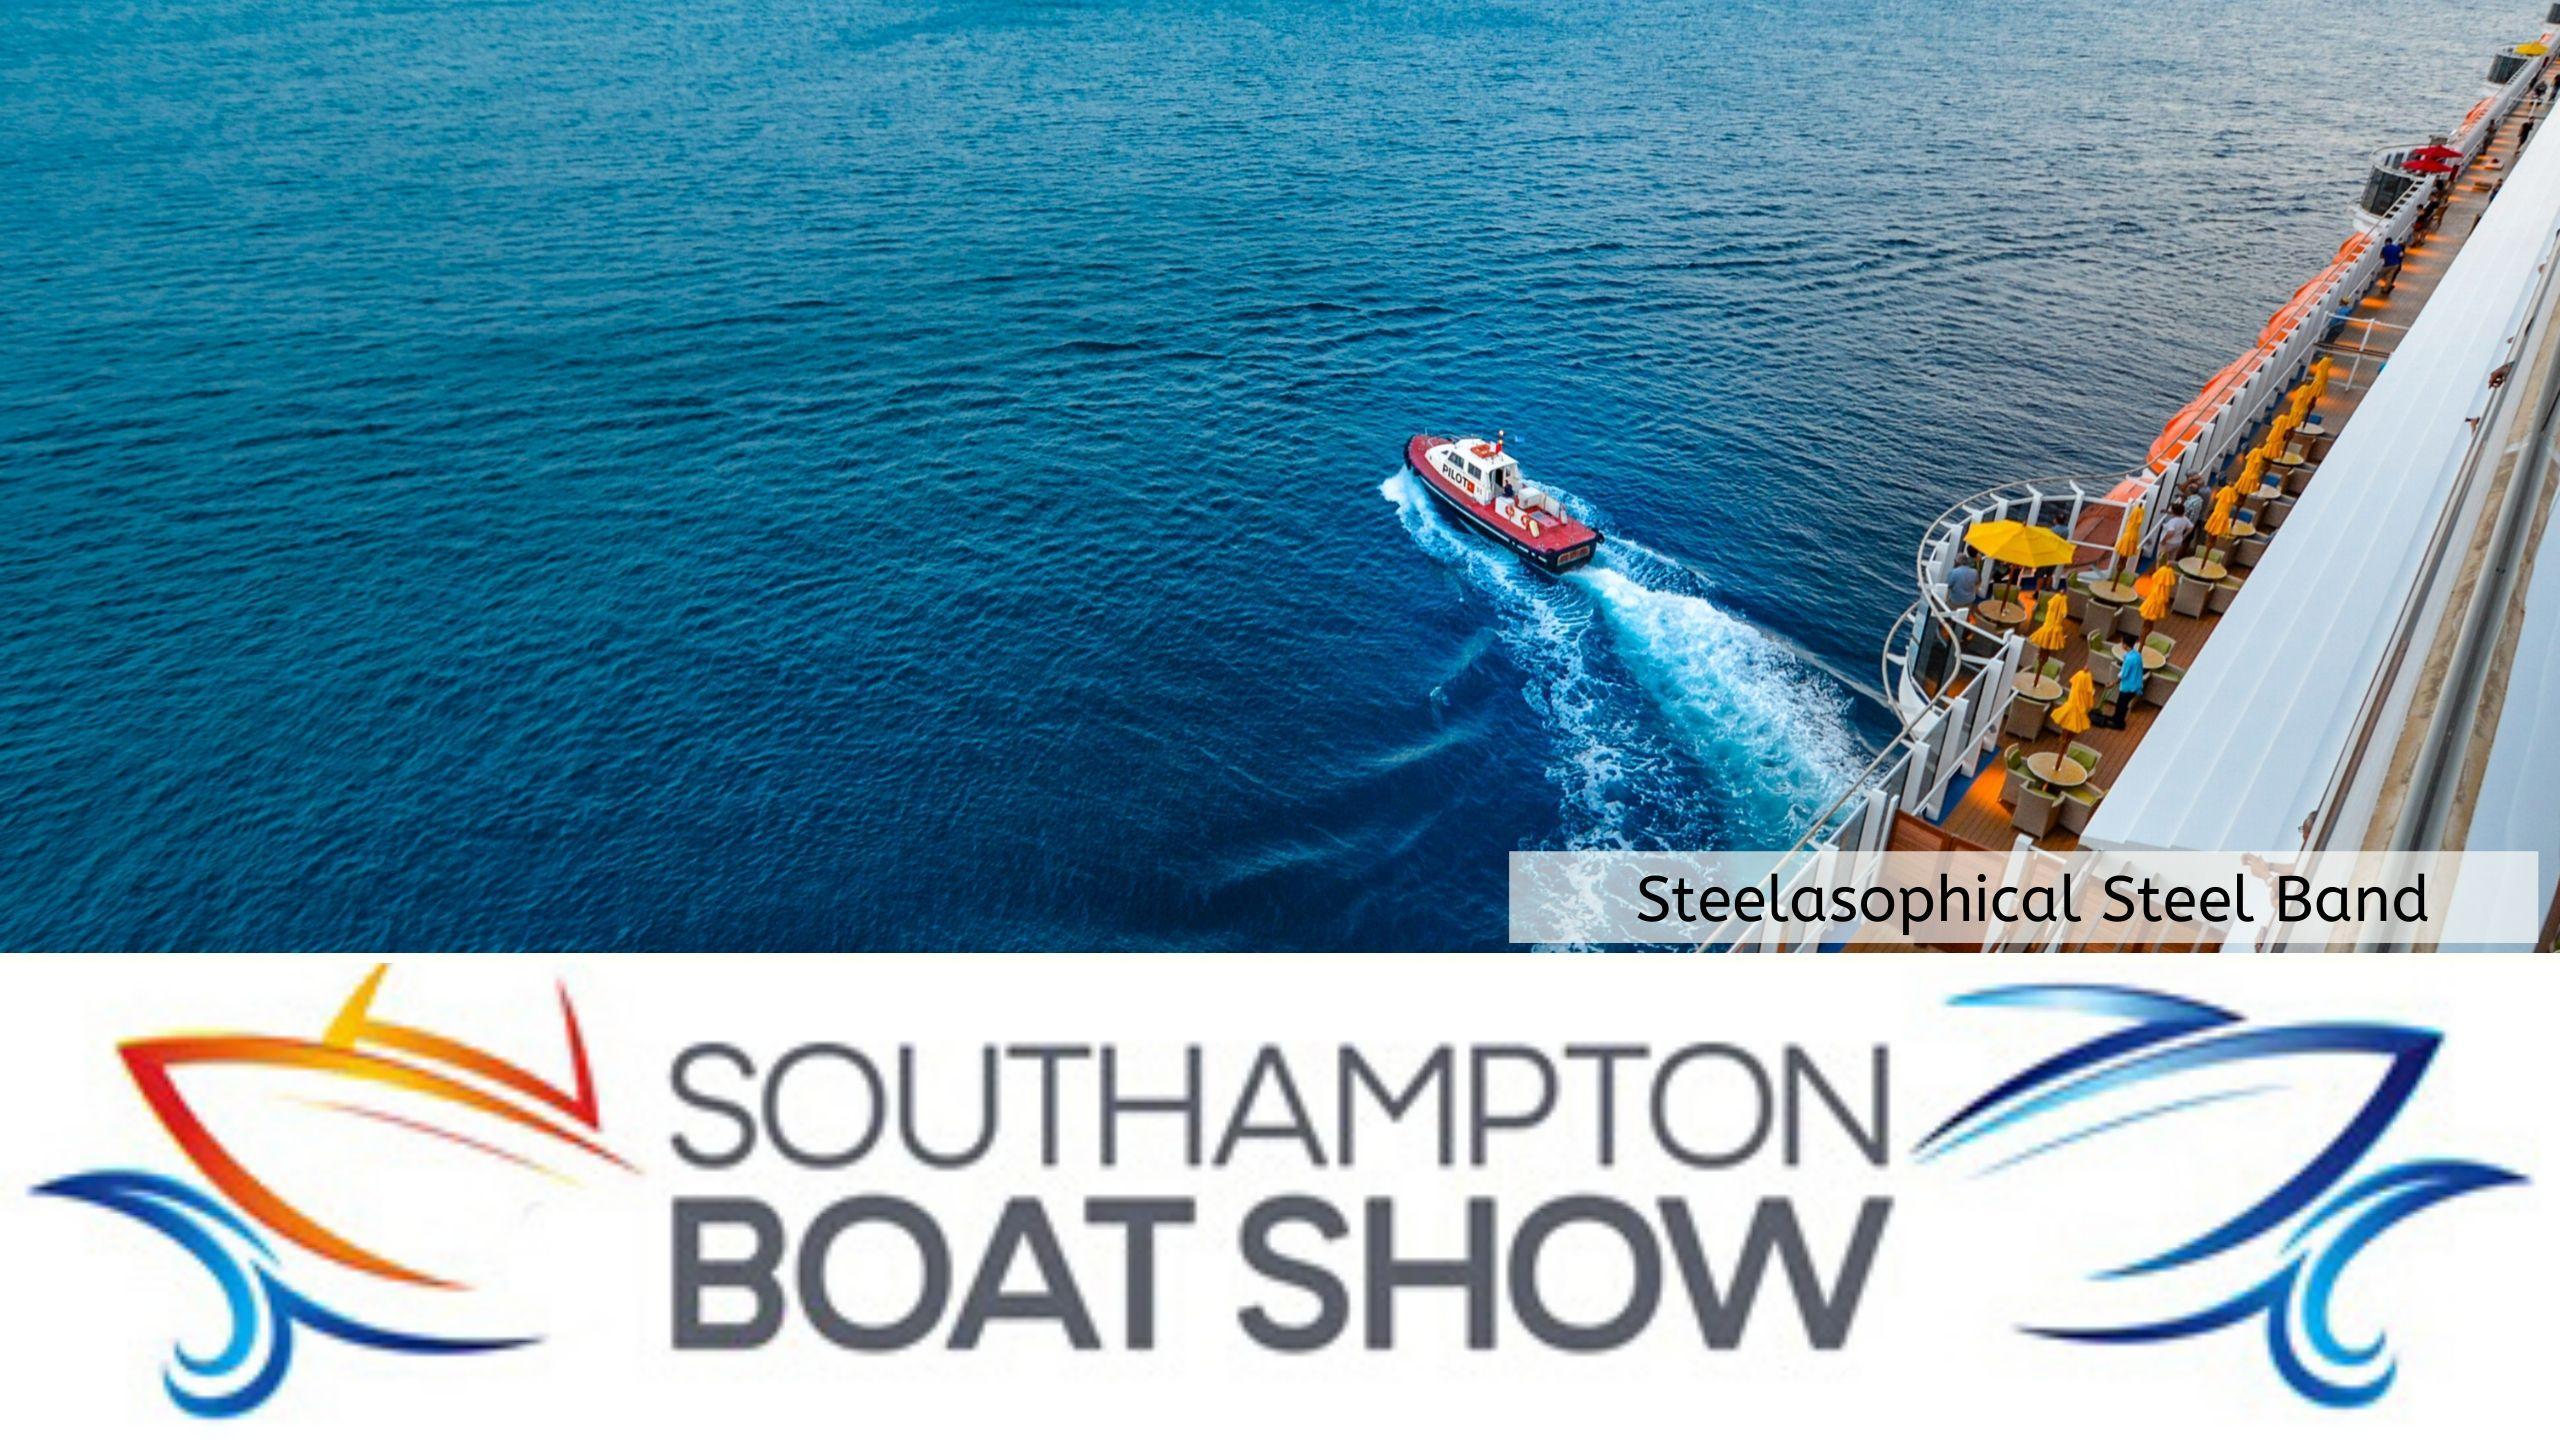 Steelasophical Steel Band Southampton Boat Show Yacht Market RFV